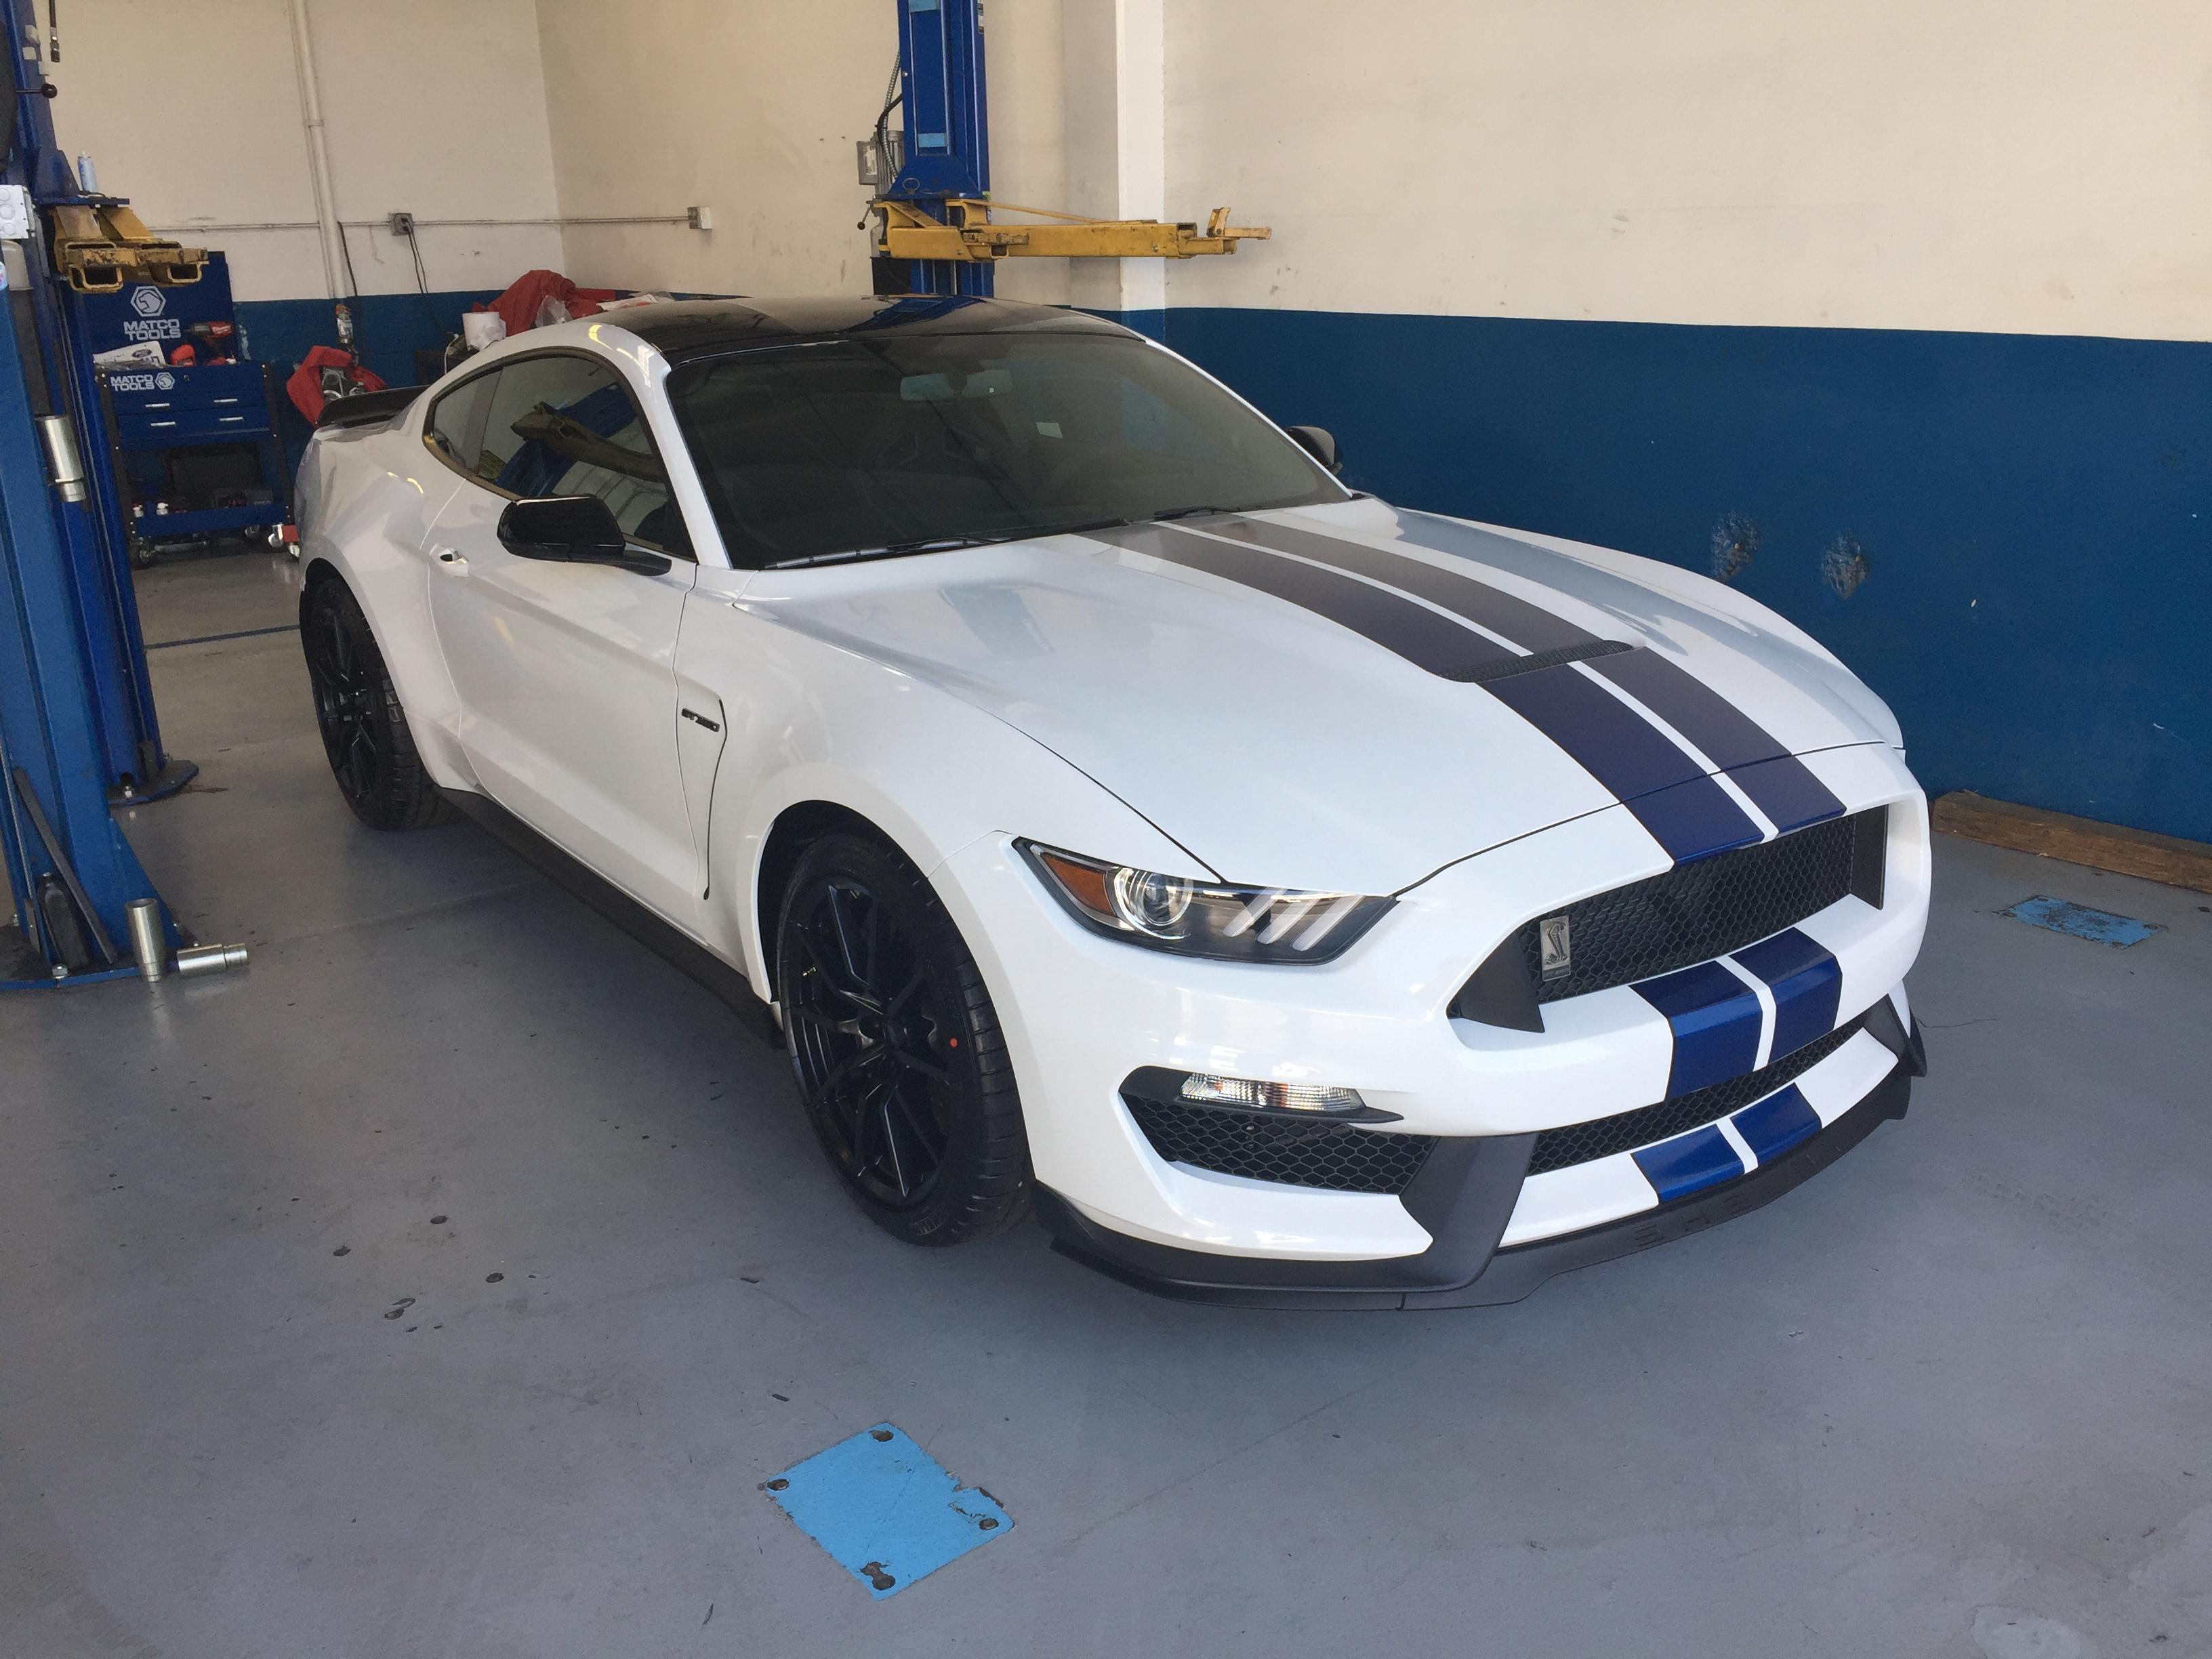 2017 Mustang Gt350 Black >> 2017 White Blue Stripes Black Roof